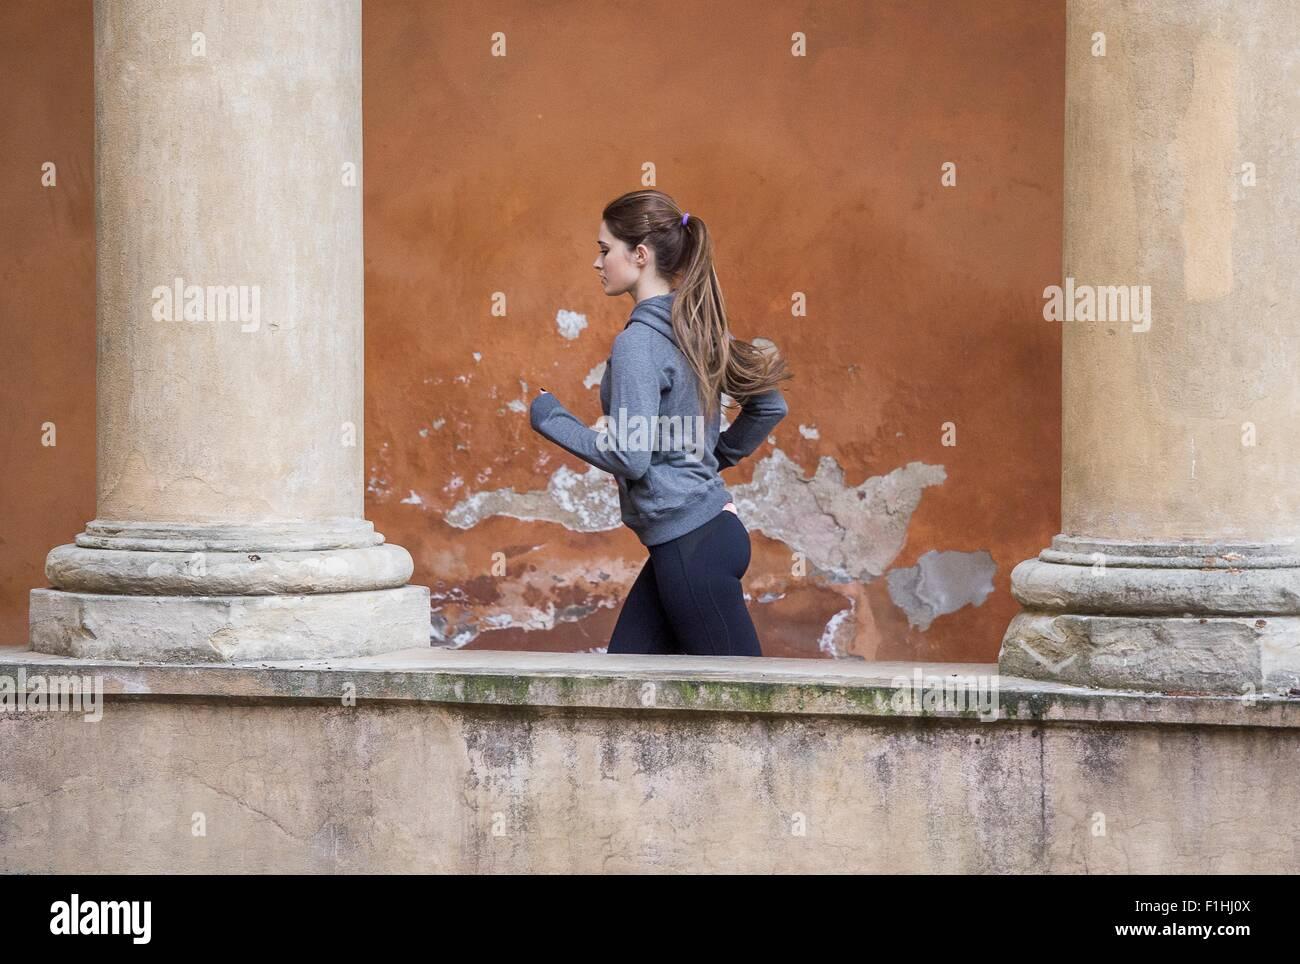 Joven mujer vistiendo ropa deportiva trotar Imagen De Stock